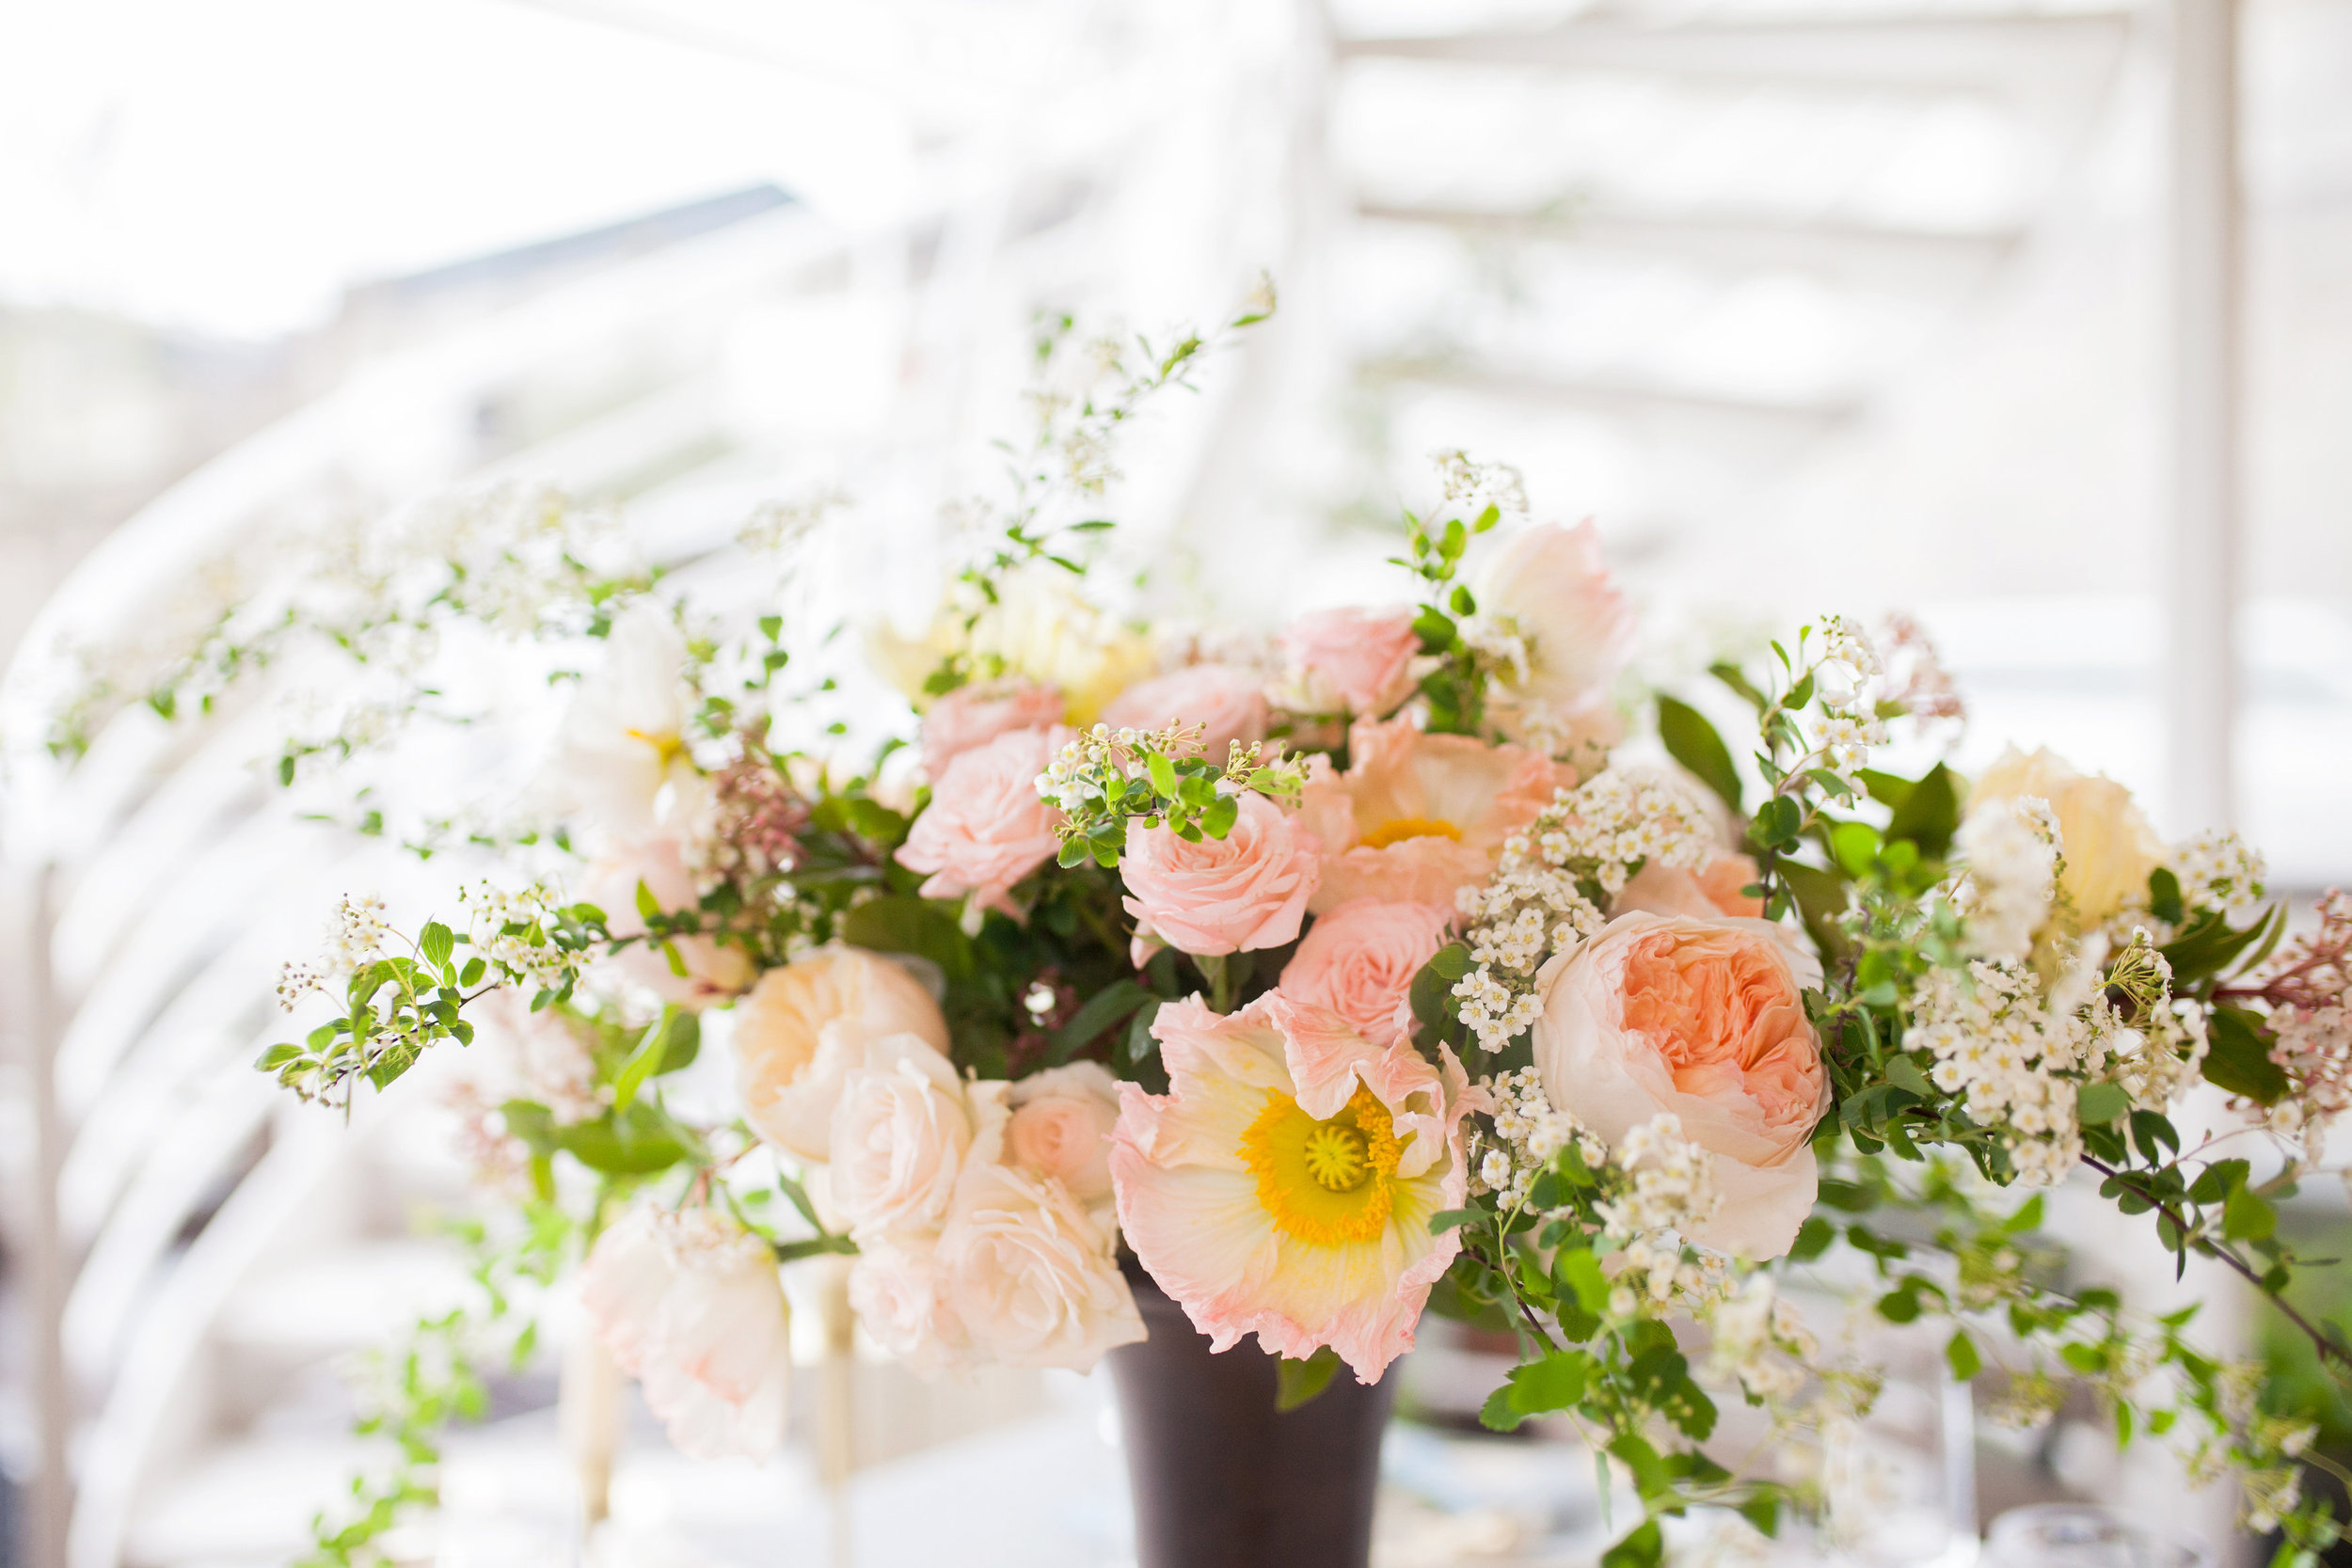 Drissia, artiste florale - 06 69 76 16 14artiste.florale@drissia.fr